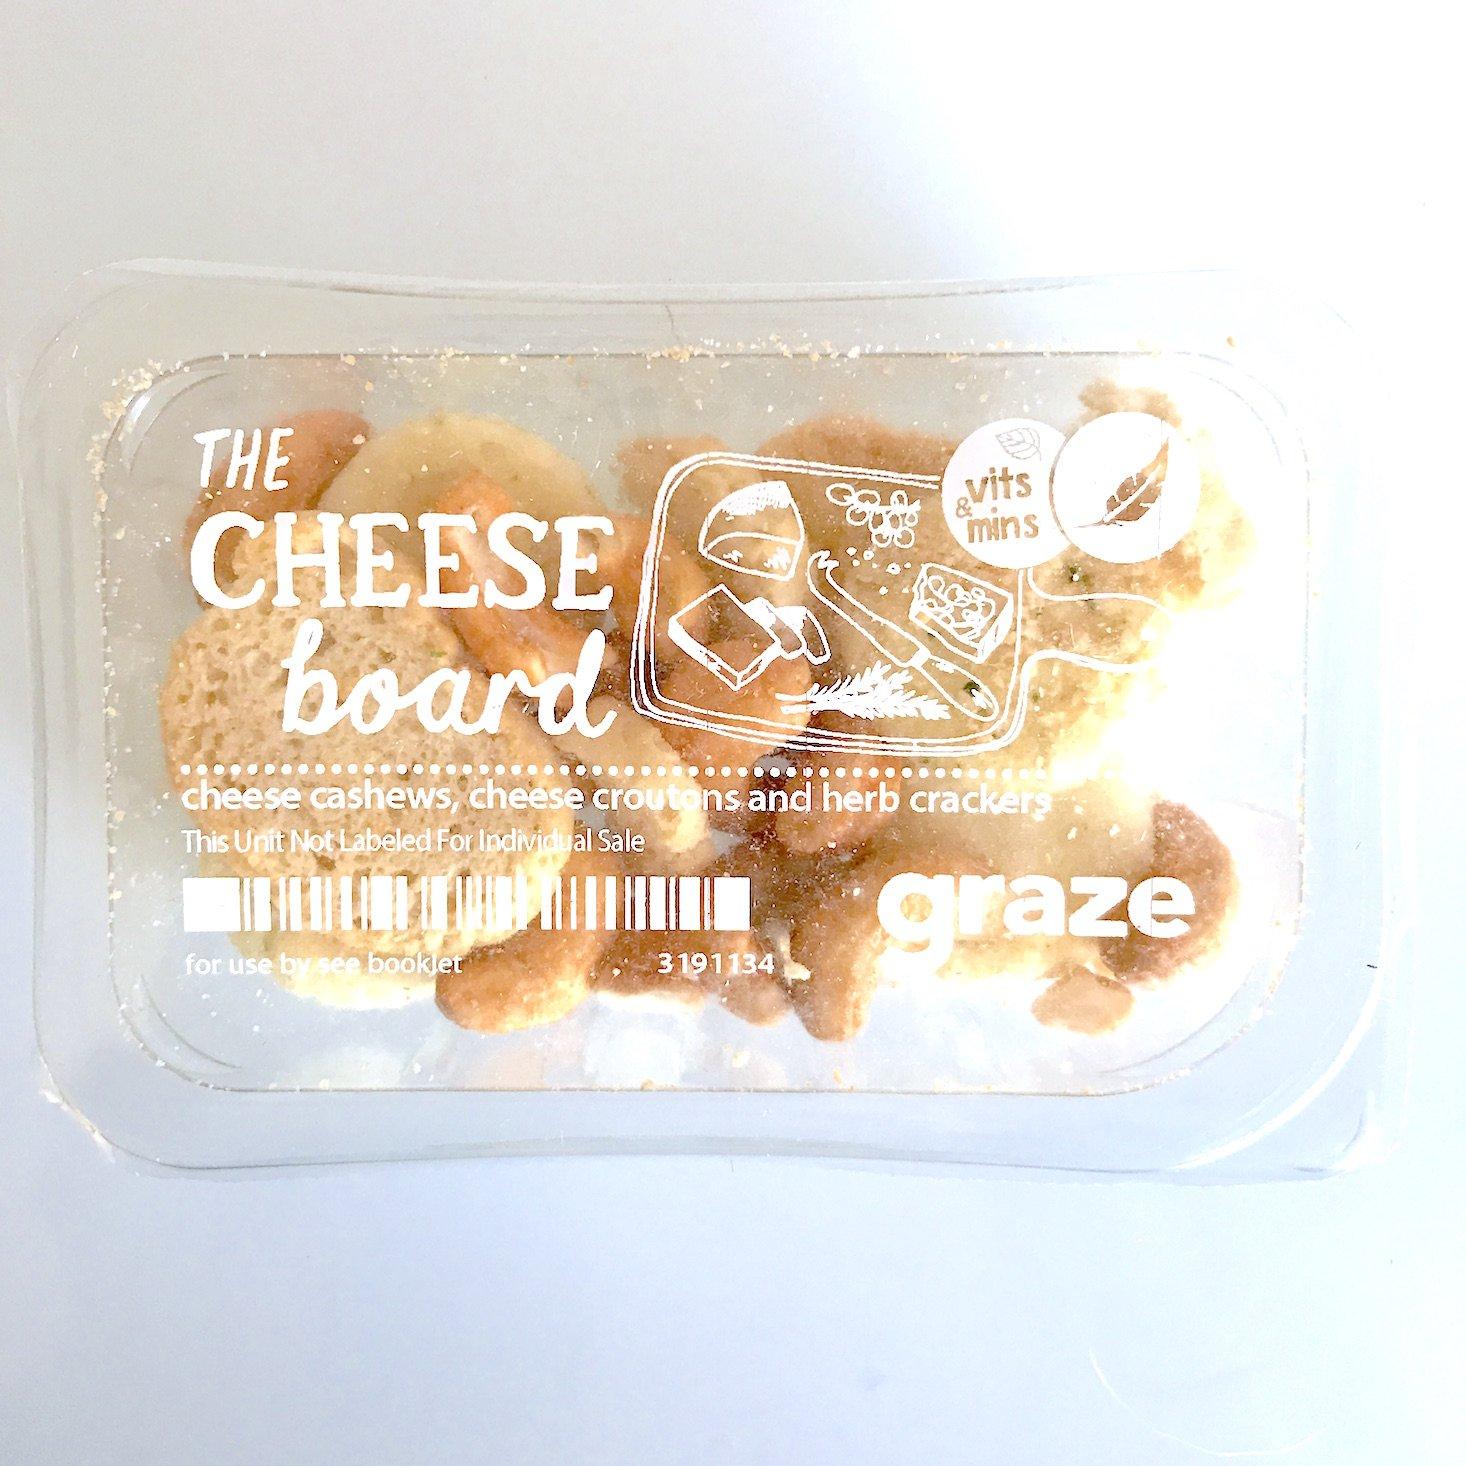 Graze January 2018 - cheese board